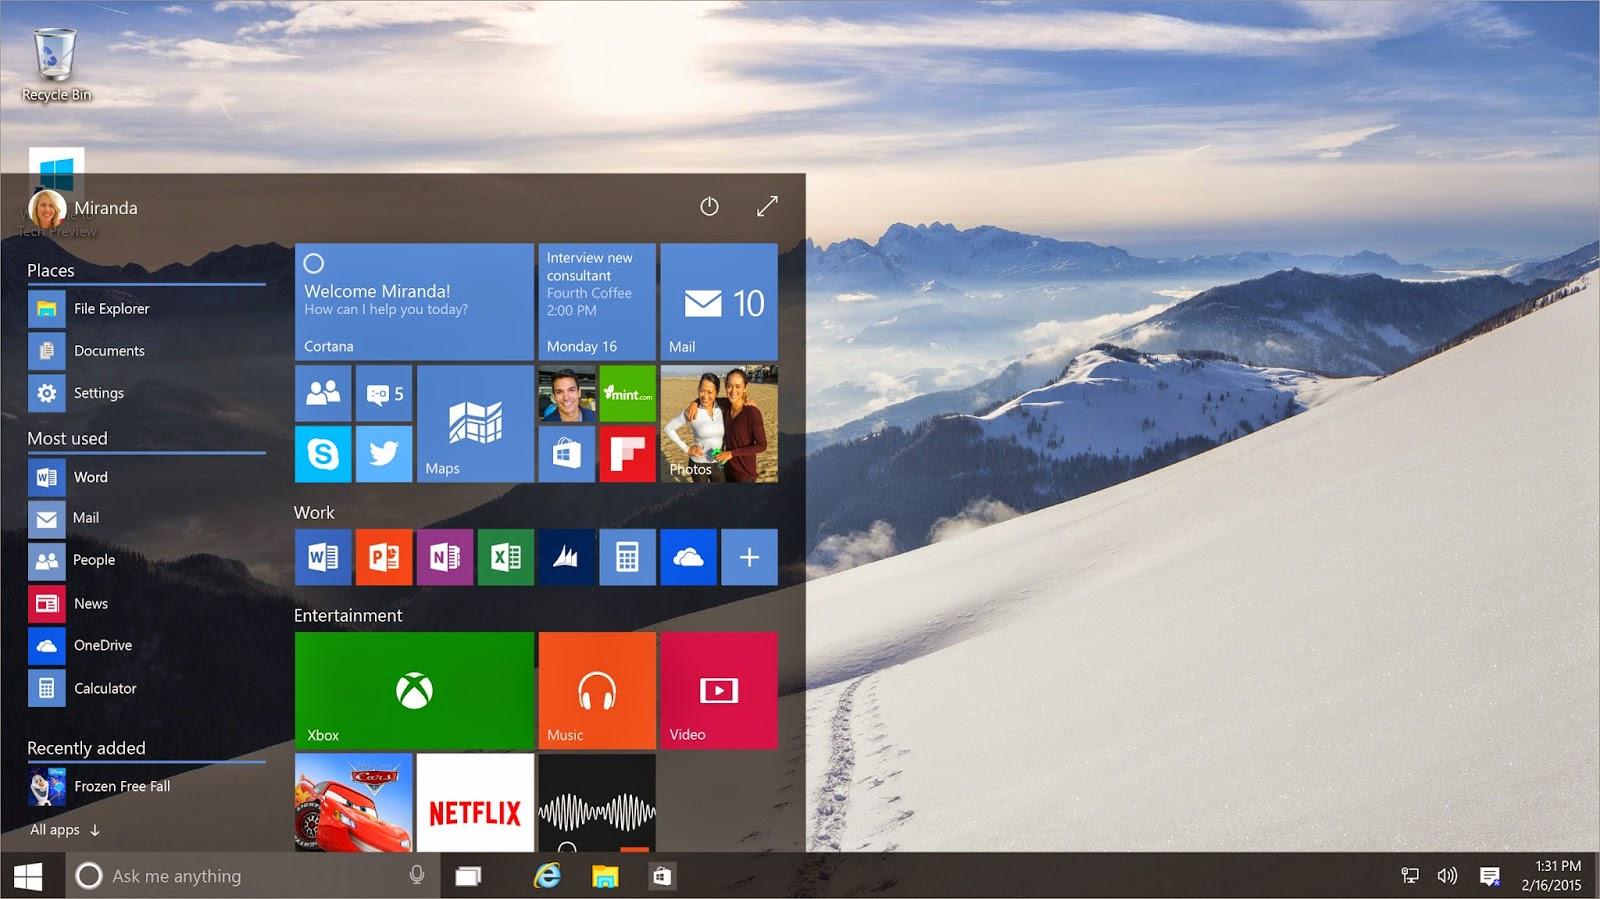 Asik, Windows 10 Bisa Dimiliki Secara Gratis